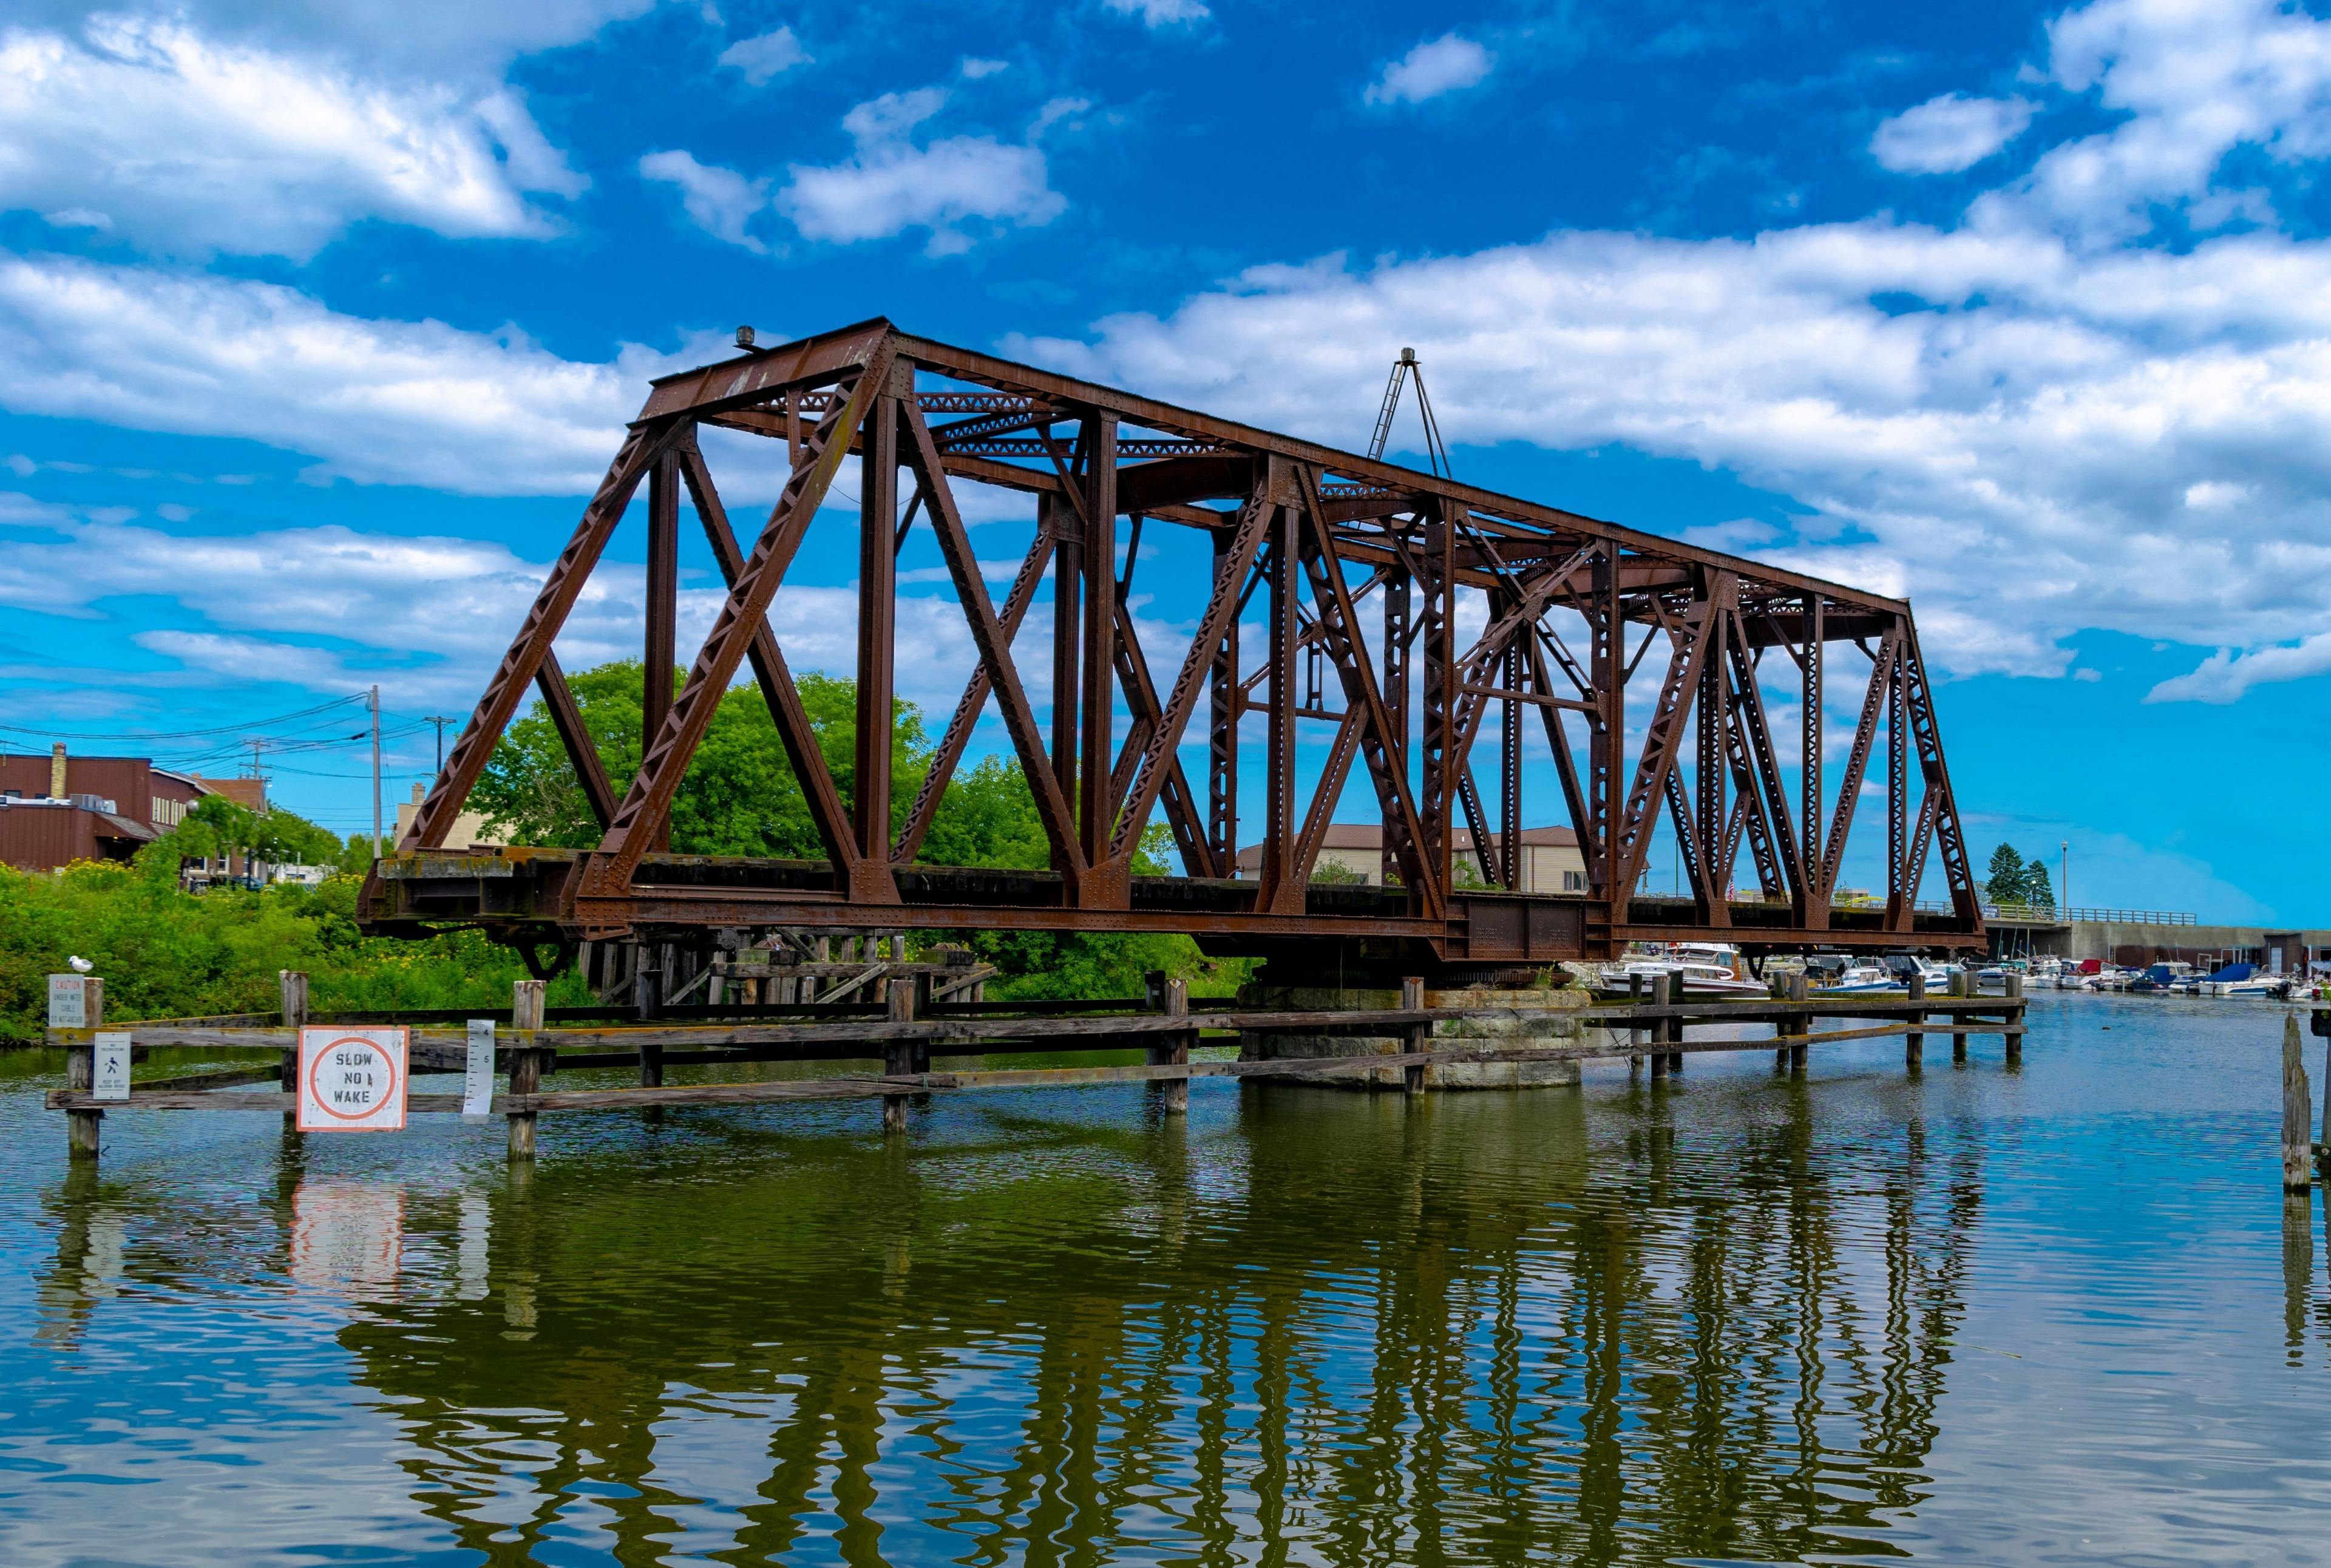 Kenosha County, Wisconsin, United States of America